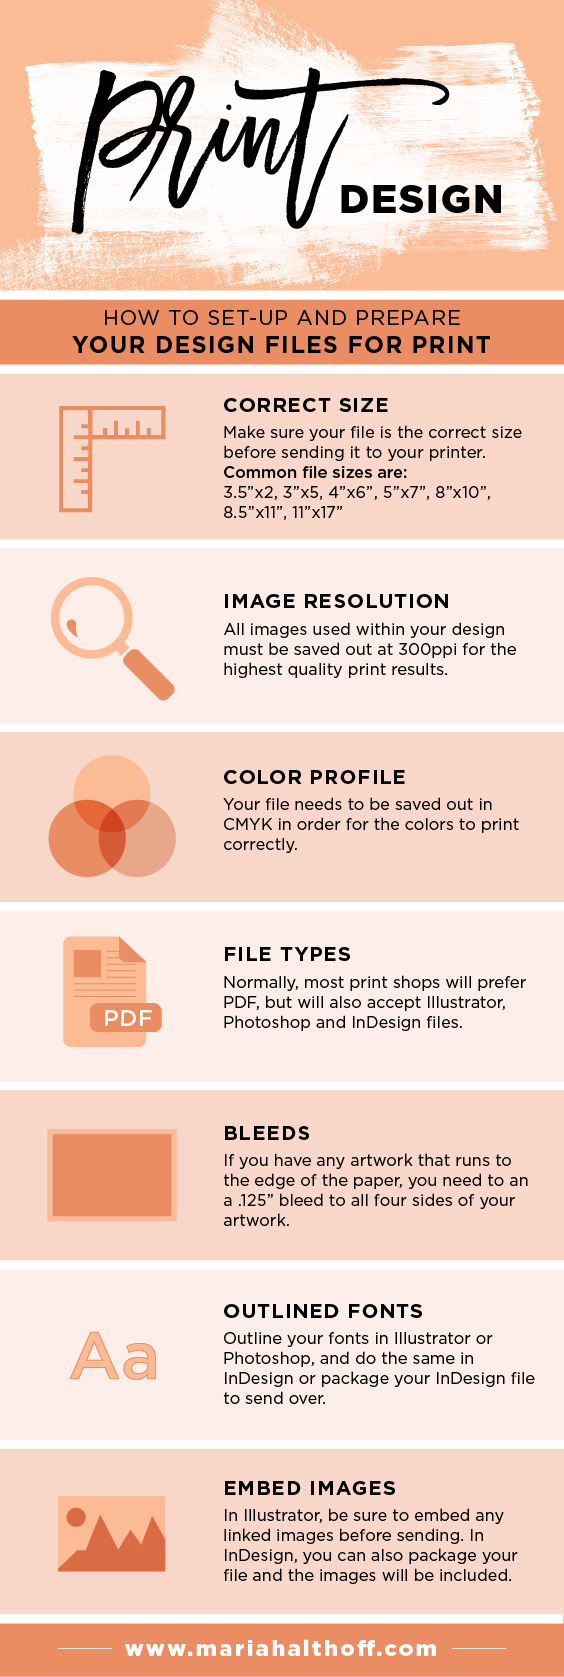 Print Design Infographic